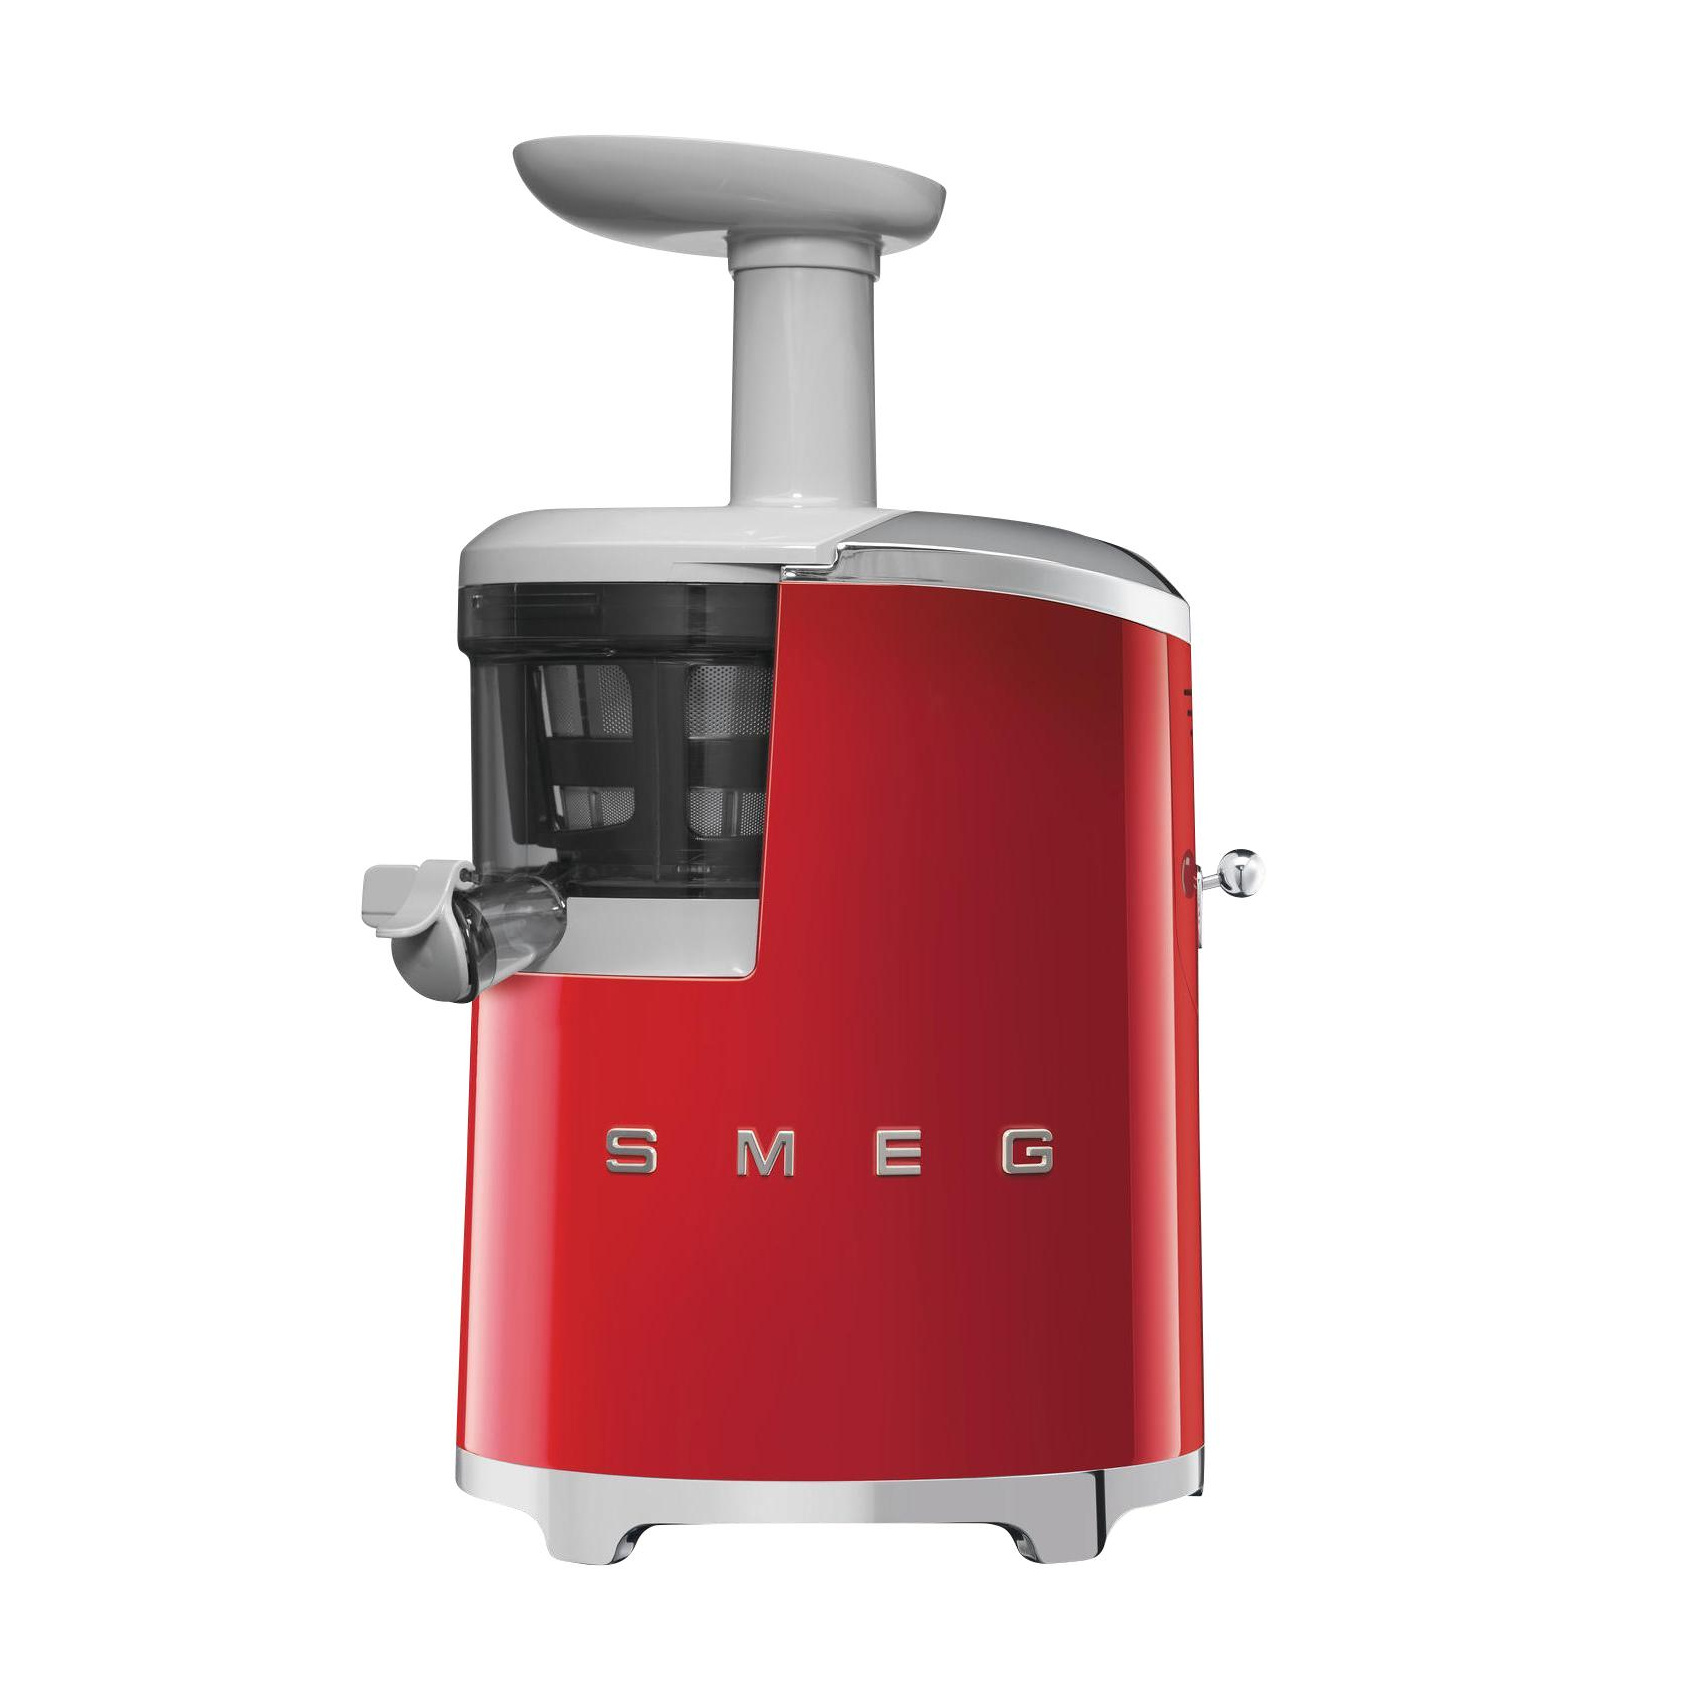 Smeg - SJF01 Slow Juicer – Entsafter - rot/mit Rezeptbuch/42x27x17cm | Küche und Esszimmer > Küchengeräte > Entsafter | Rot | Edelstahl| kunststoff | Smeg